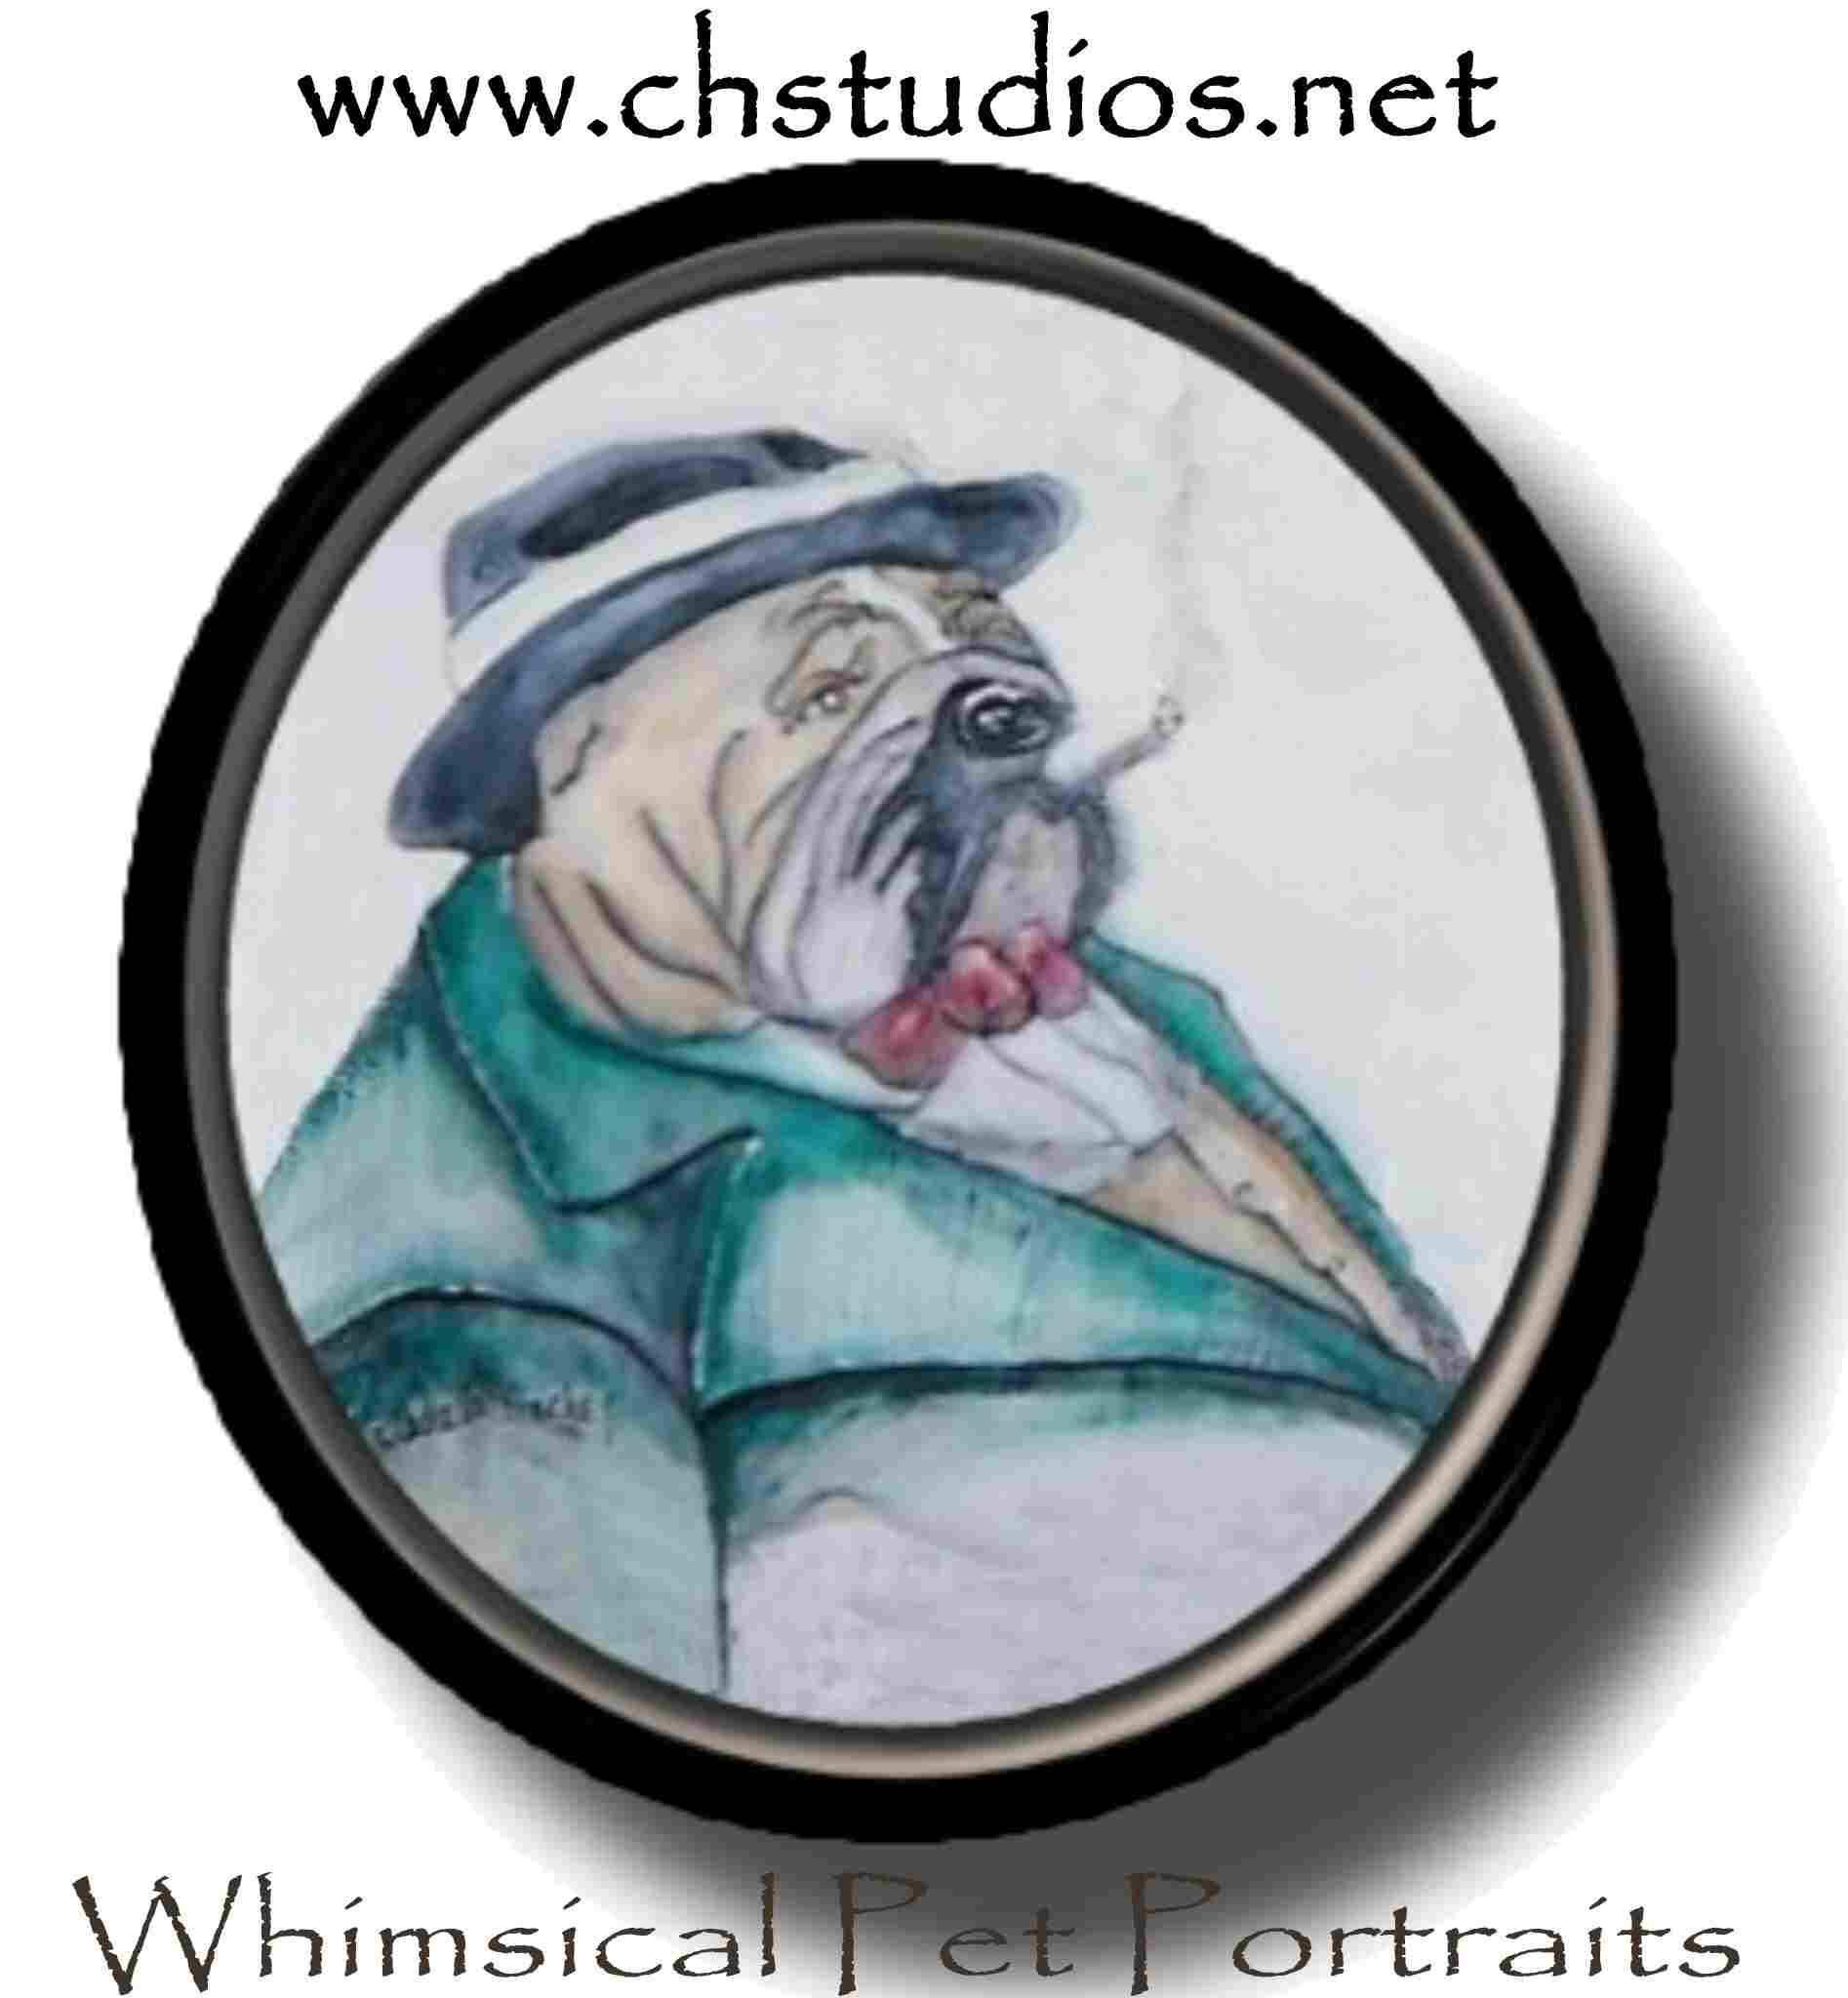 Whimsical Smoking English Bulldog